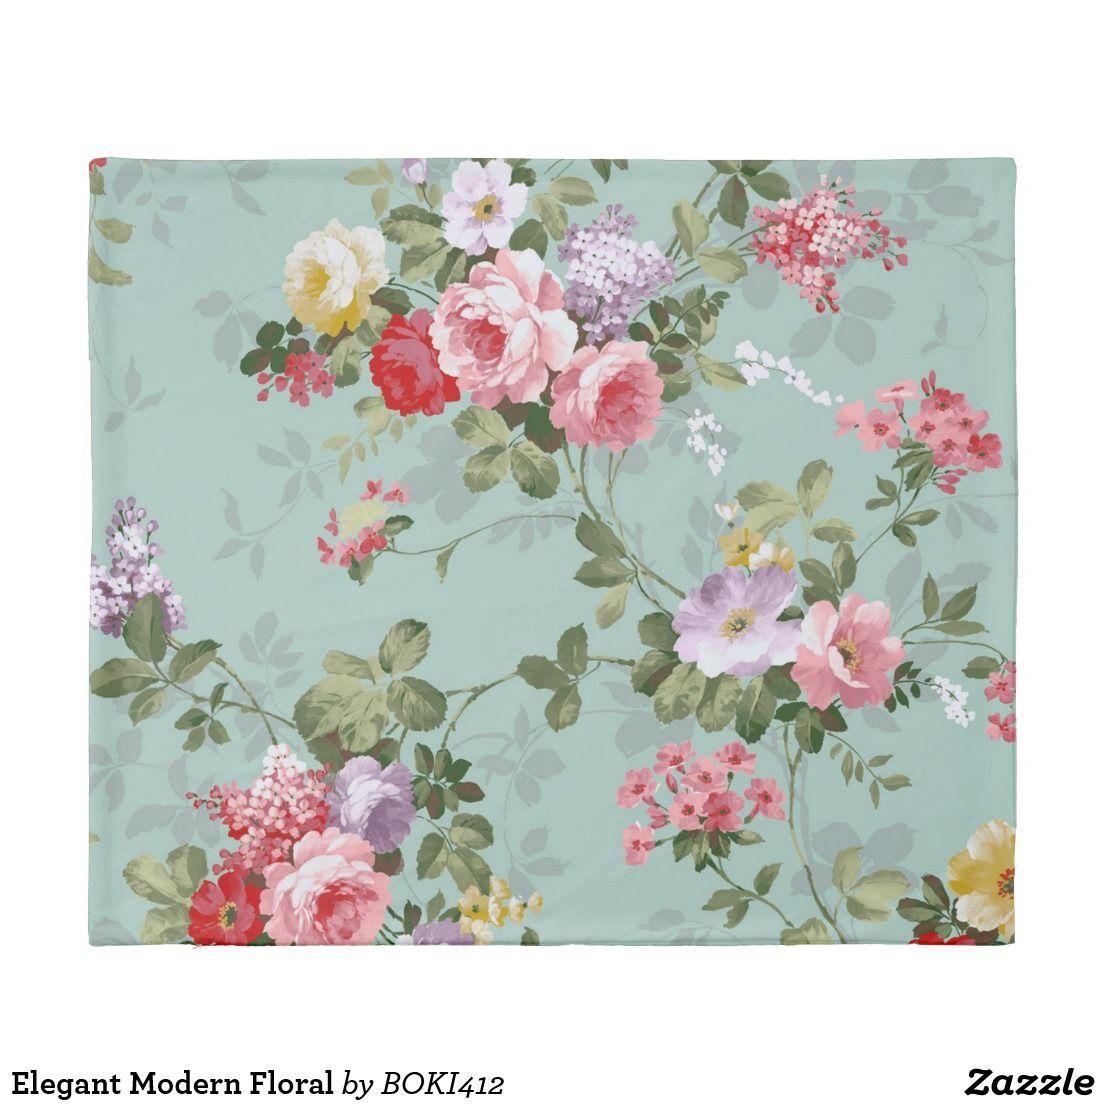 Elegant Modern Floral Duvet Cover Zazzle Com Iphone Wallpaper